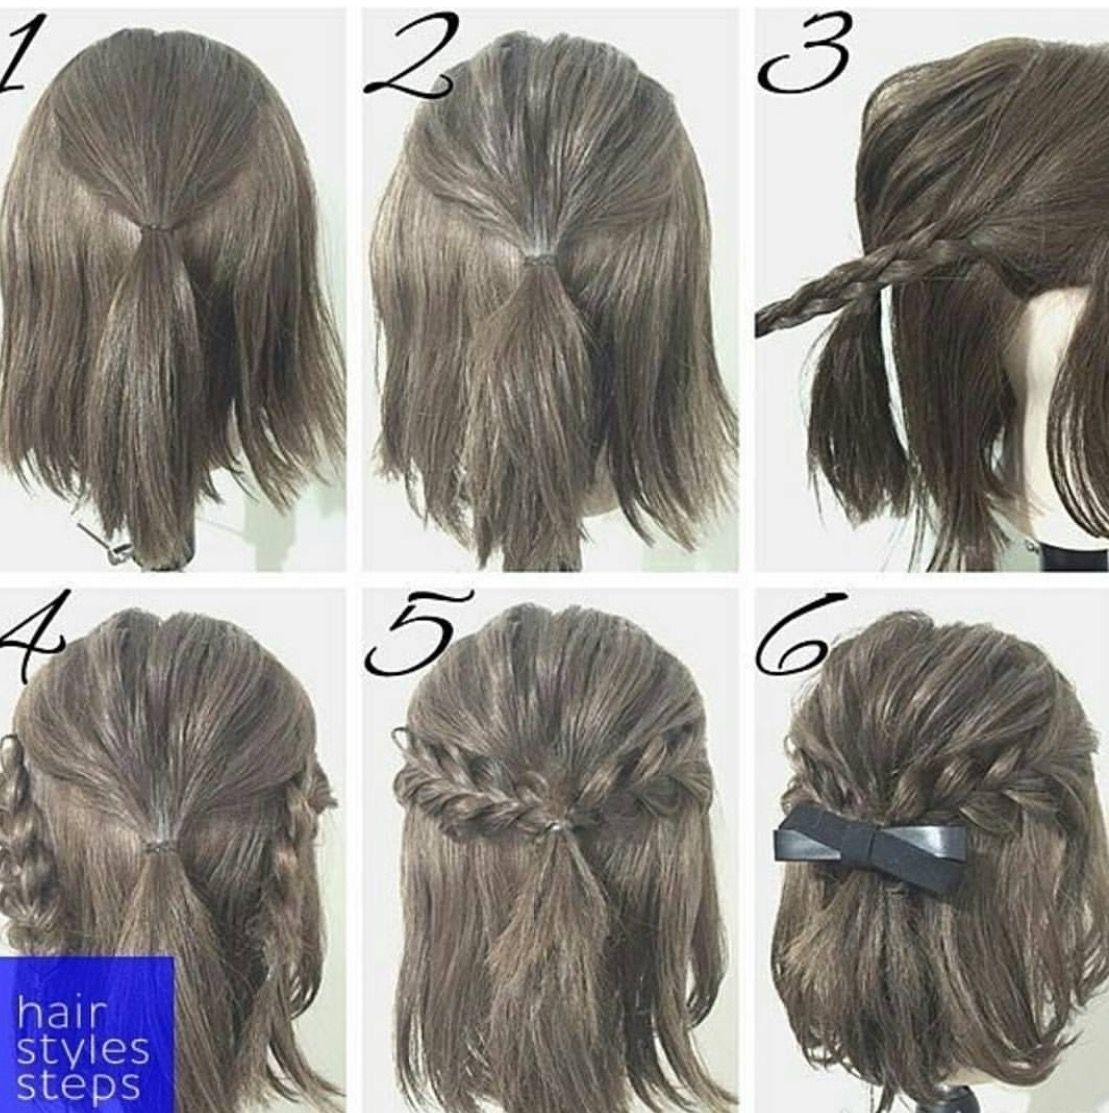 Pin By Karen Clark On Stella Short Hair Styles Simple Prom Hair Hair Styles